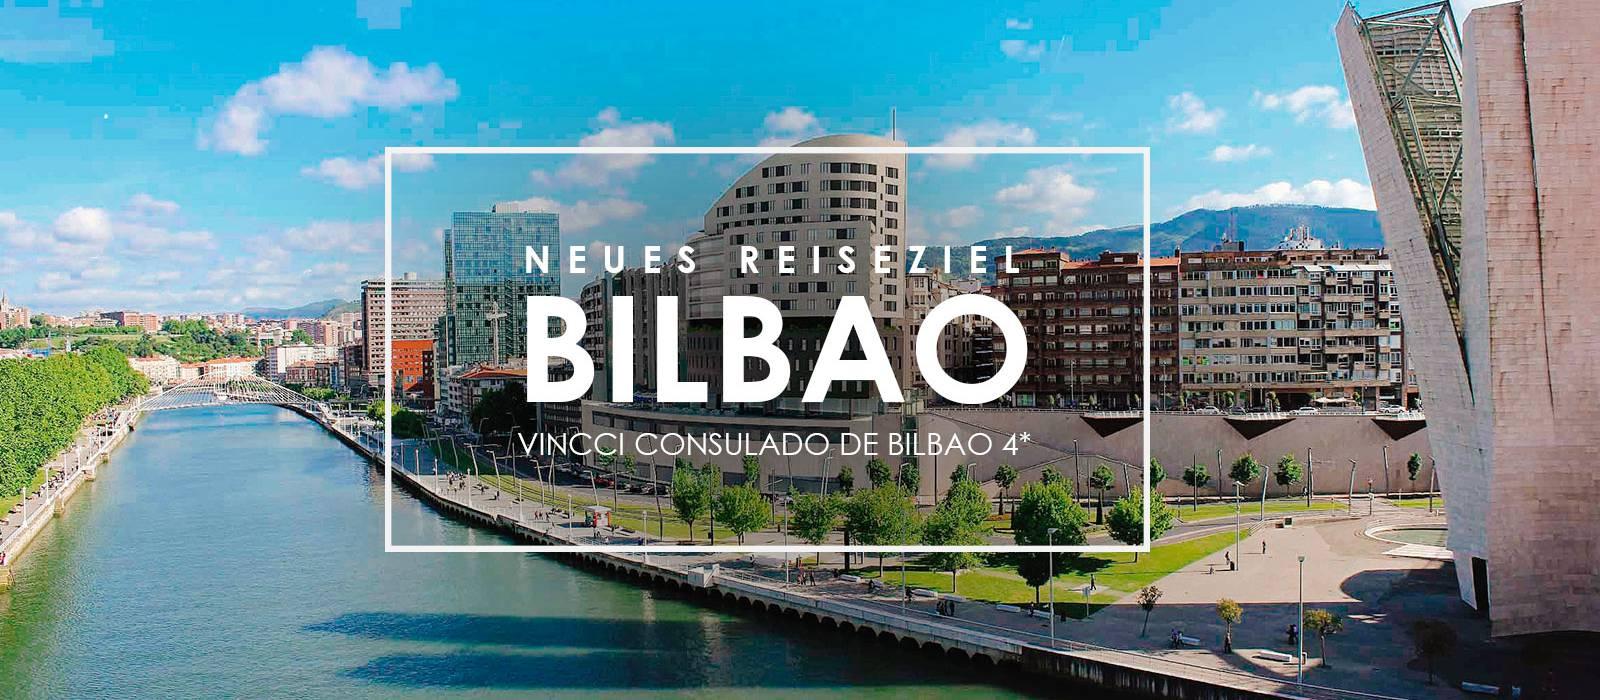 Apertura Bilbao DE - Vincci Consulado de Bilbao